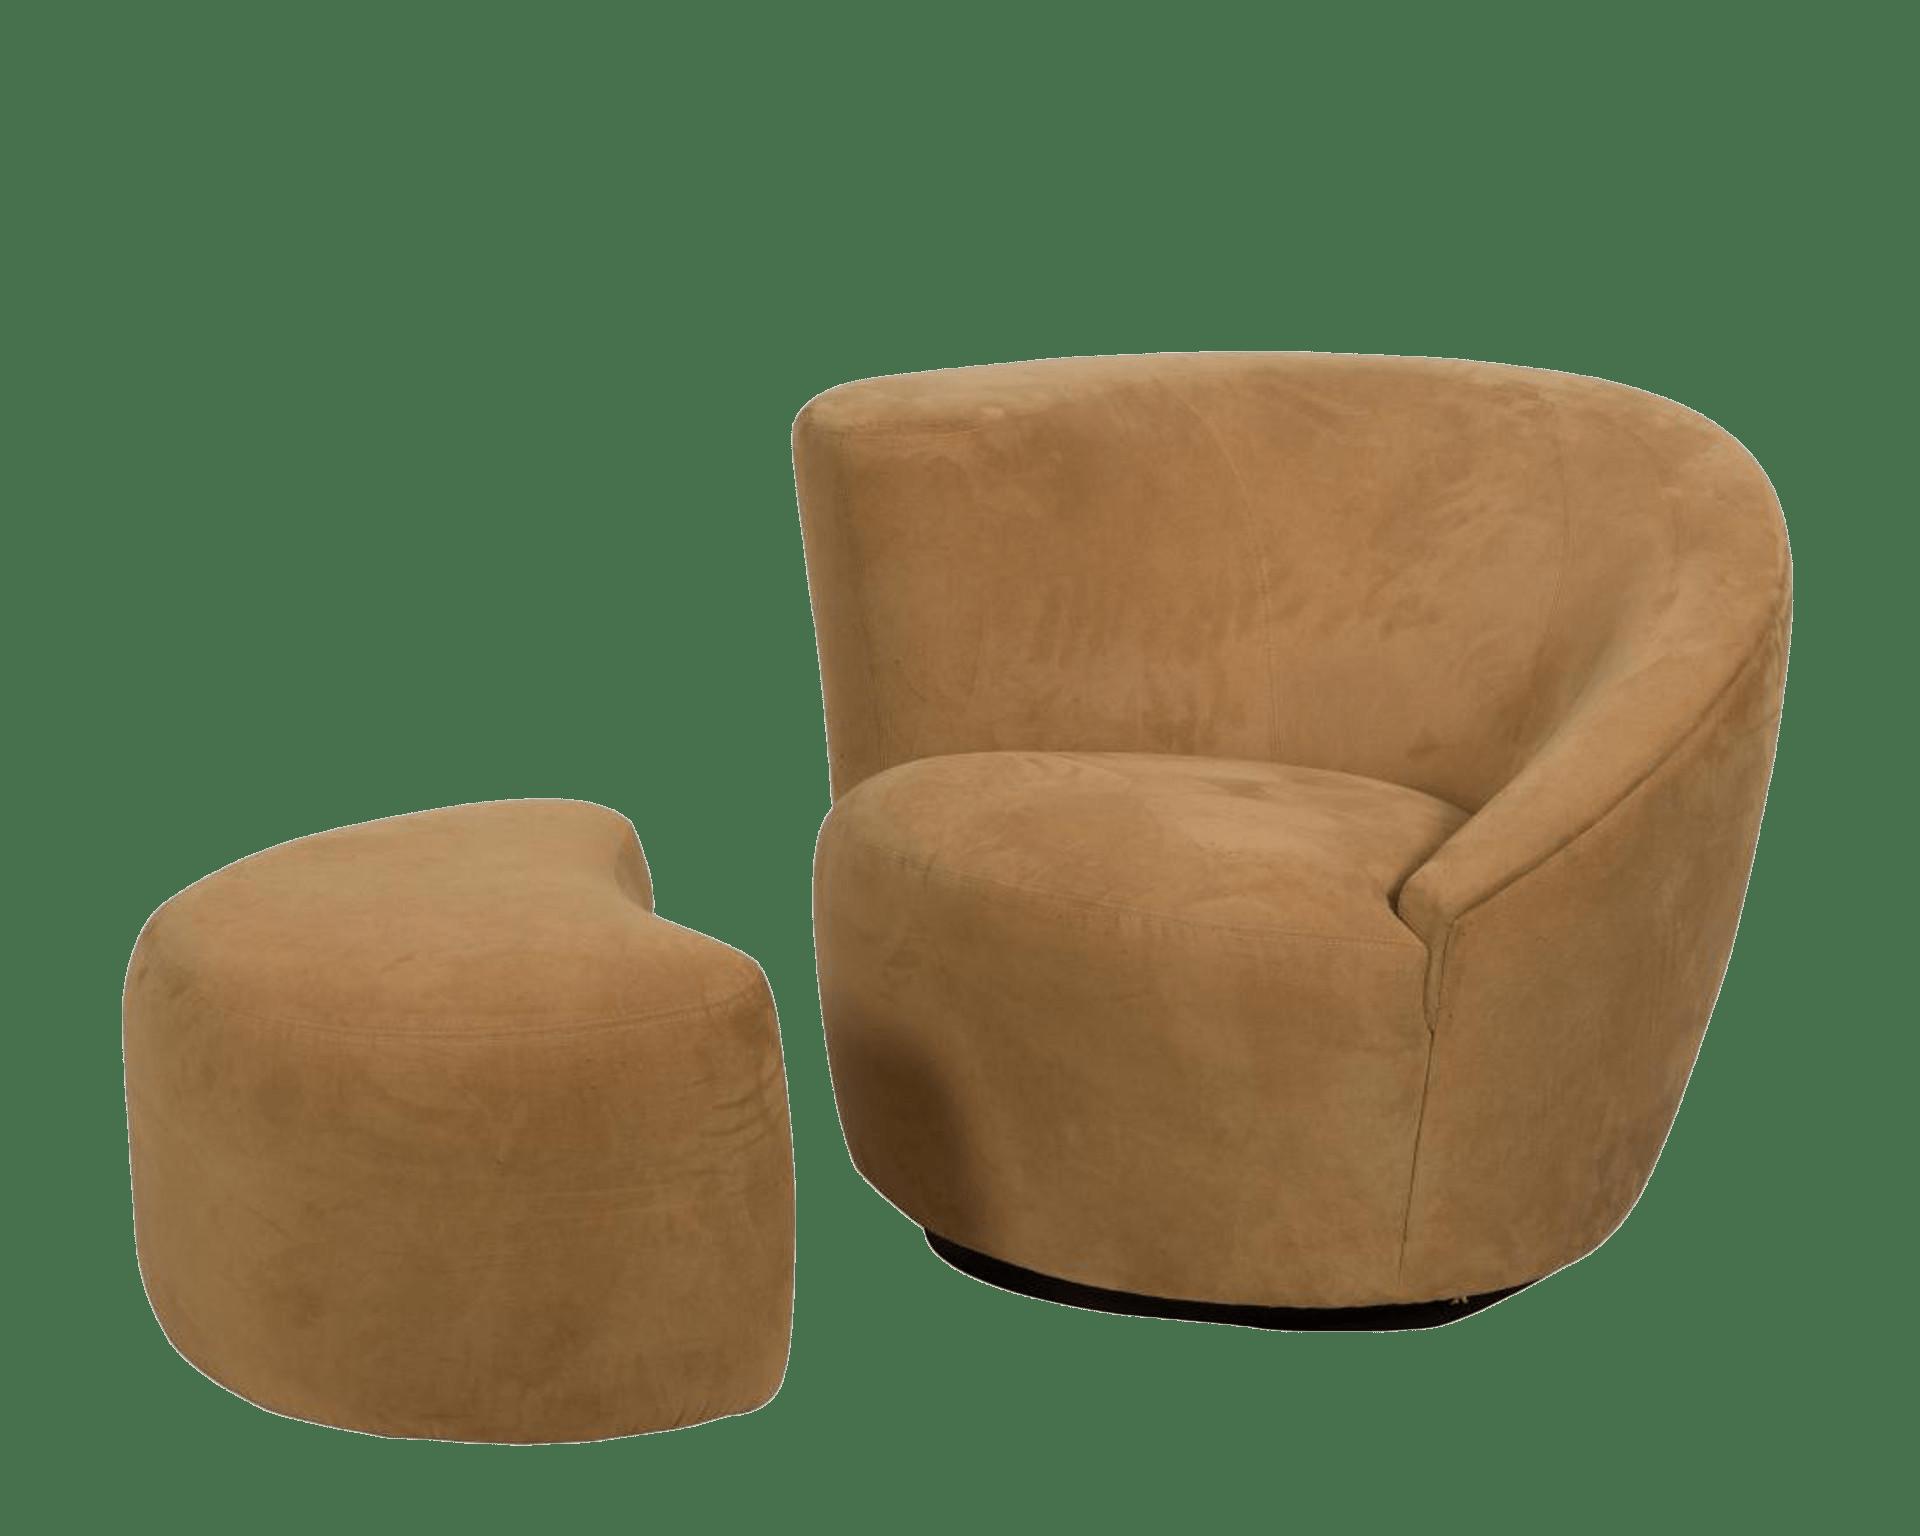 swivel club chair xl zero gravity with canopy footrest vladimir kagan nautilus corkscrew and ottoman chairish